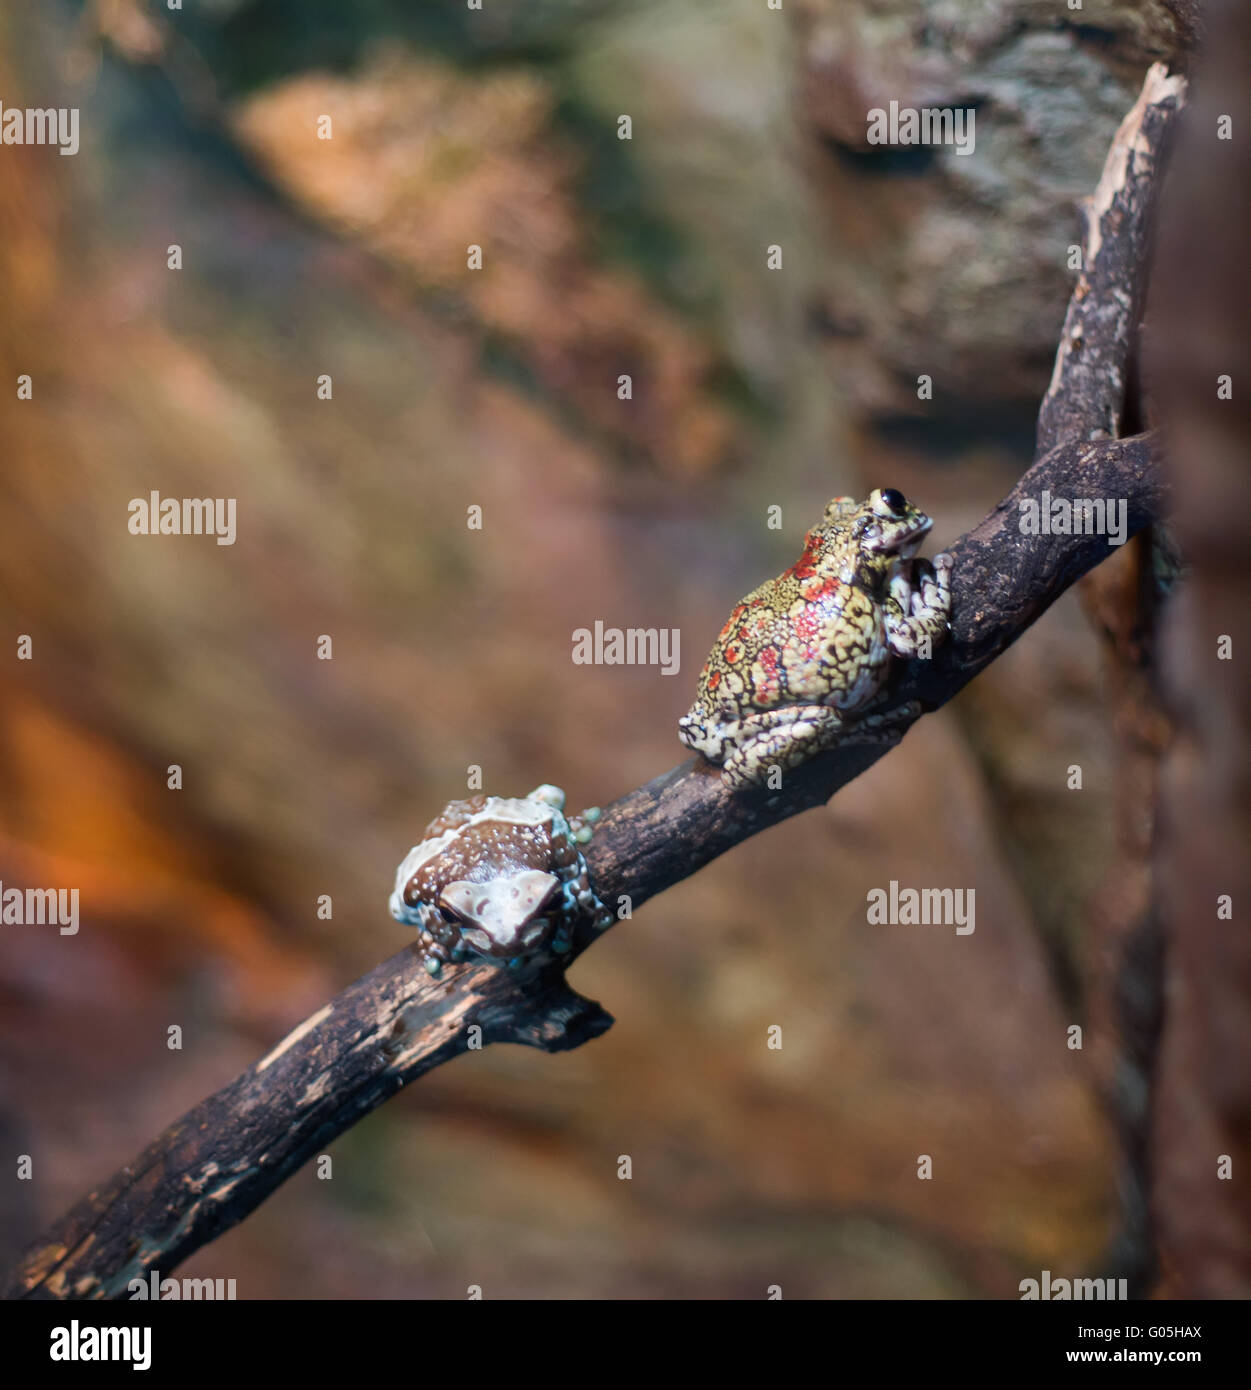 Frog tropical reptile amasonia jungles animal - Stock Image